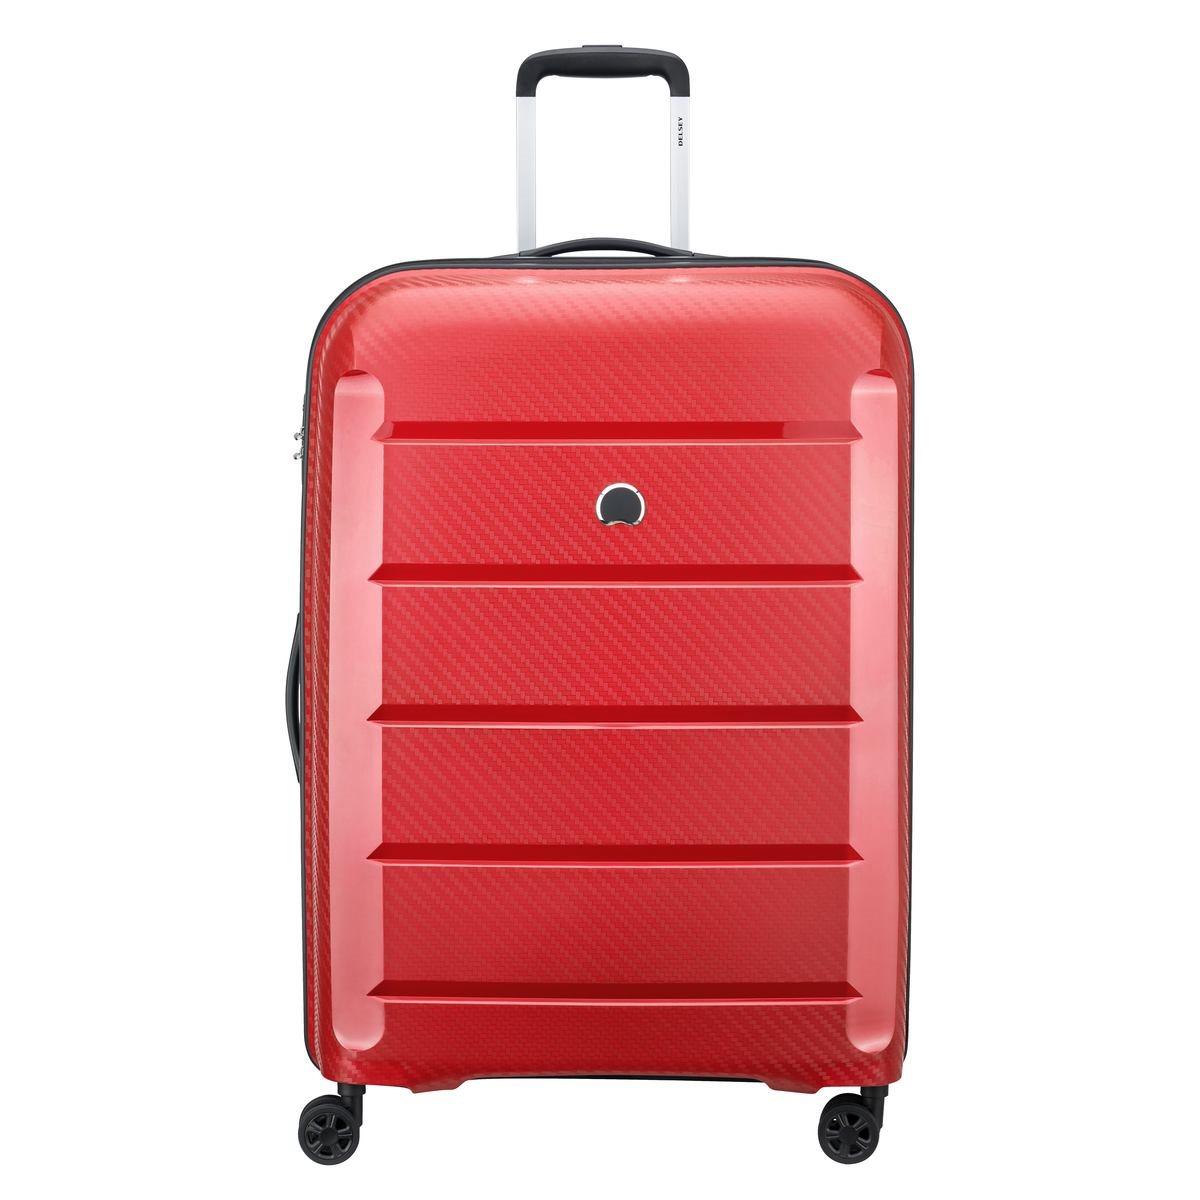 Delsey Βαλίτσα μεγάλη 75x53x30cm σειρά Binalog Red